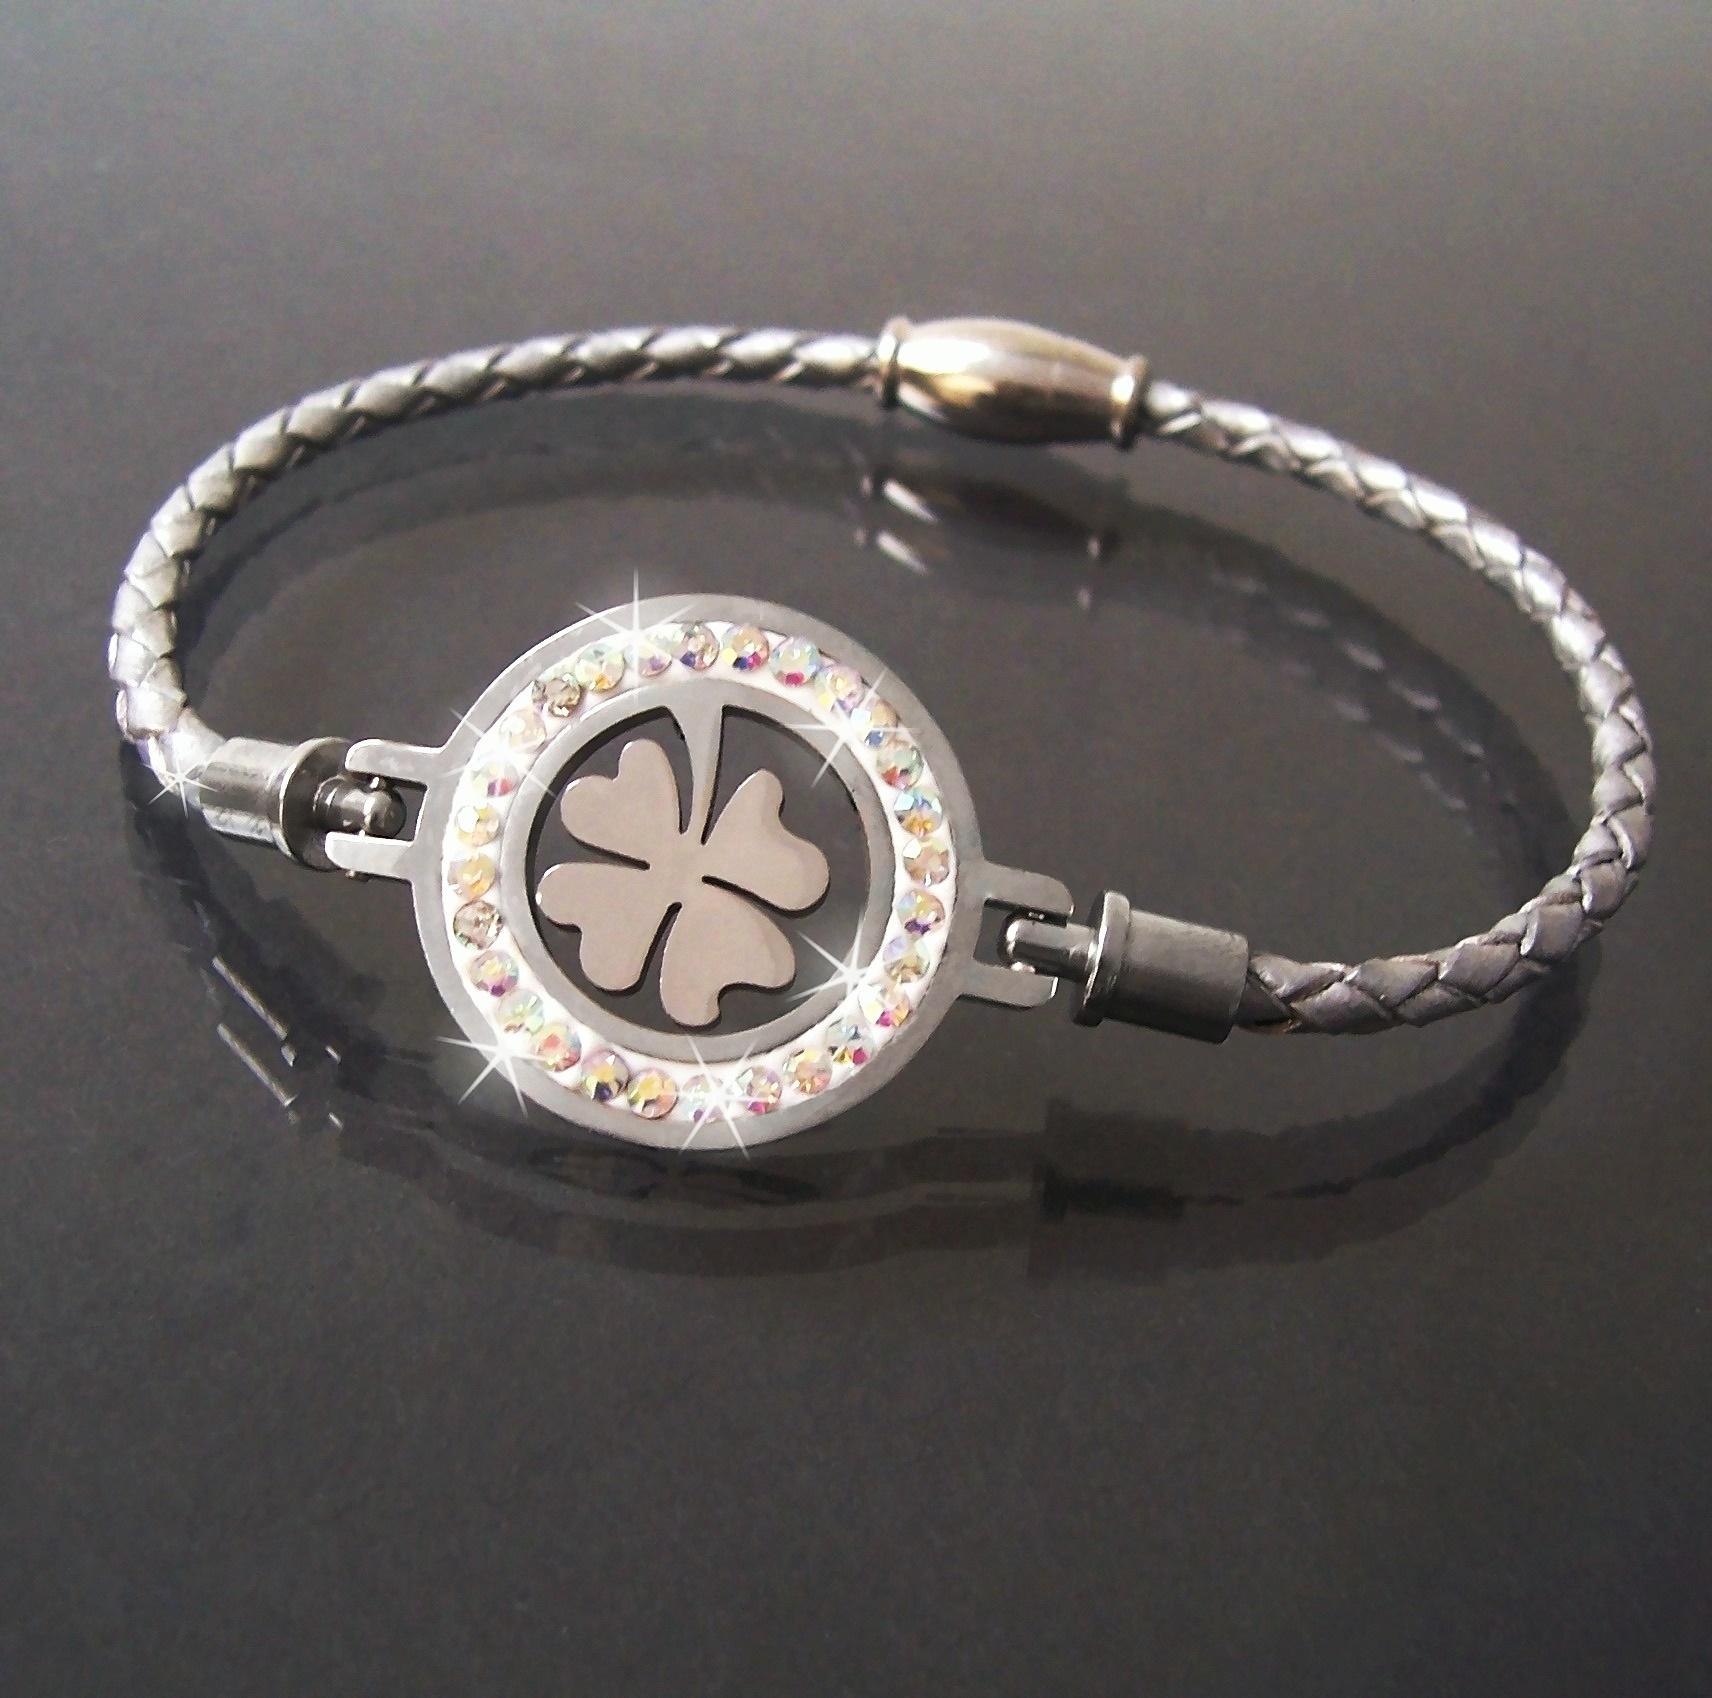 Armband Leder silber Edelstahl Magnet Kleeblatt Strass Damen A77749